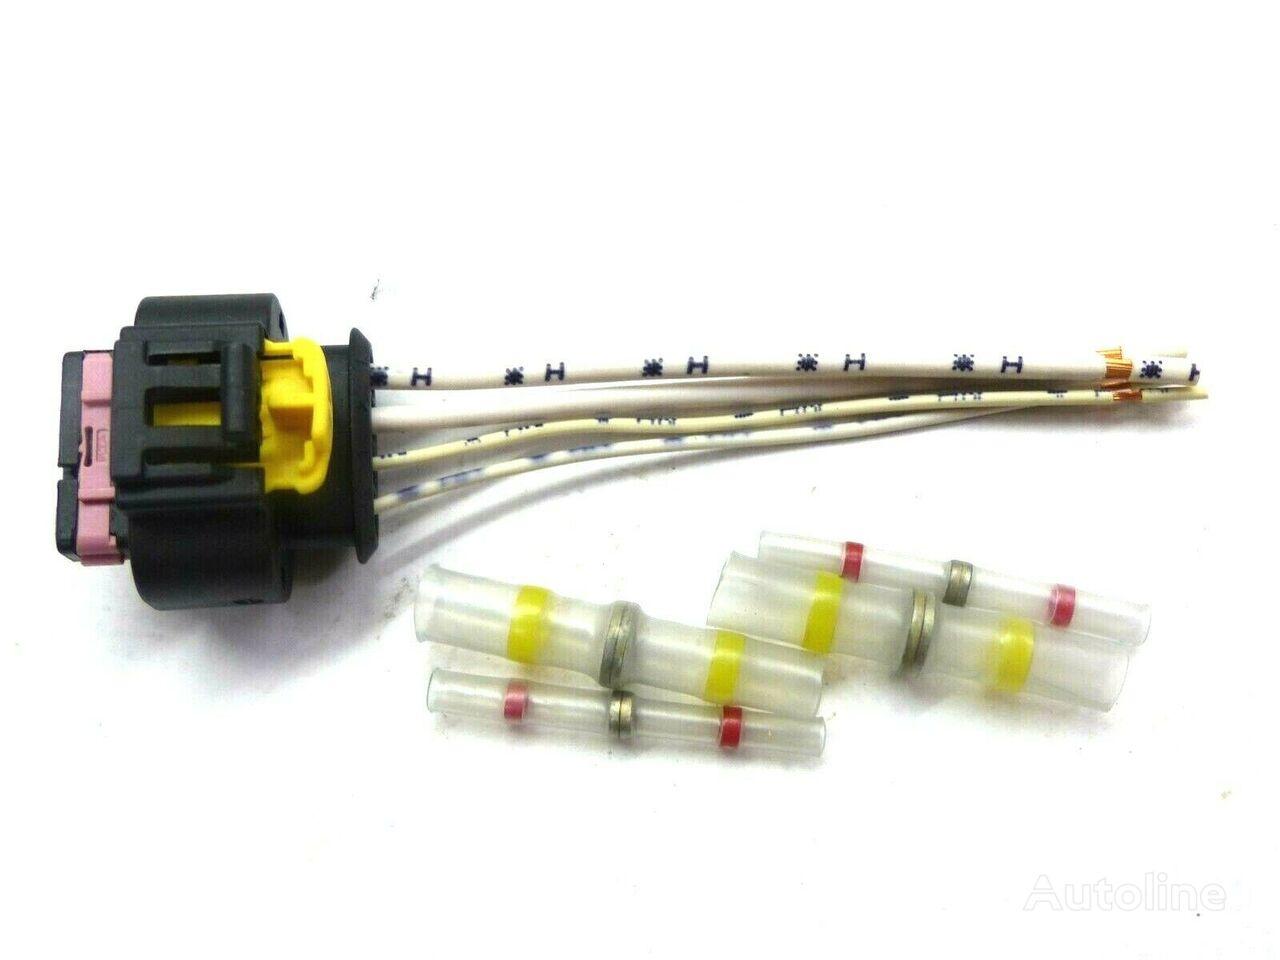 FIAT Kit Stecker (1368973080) kit de reparación para FIAT automóvil